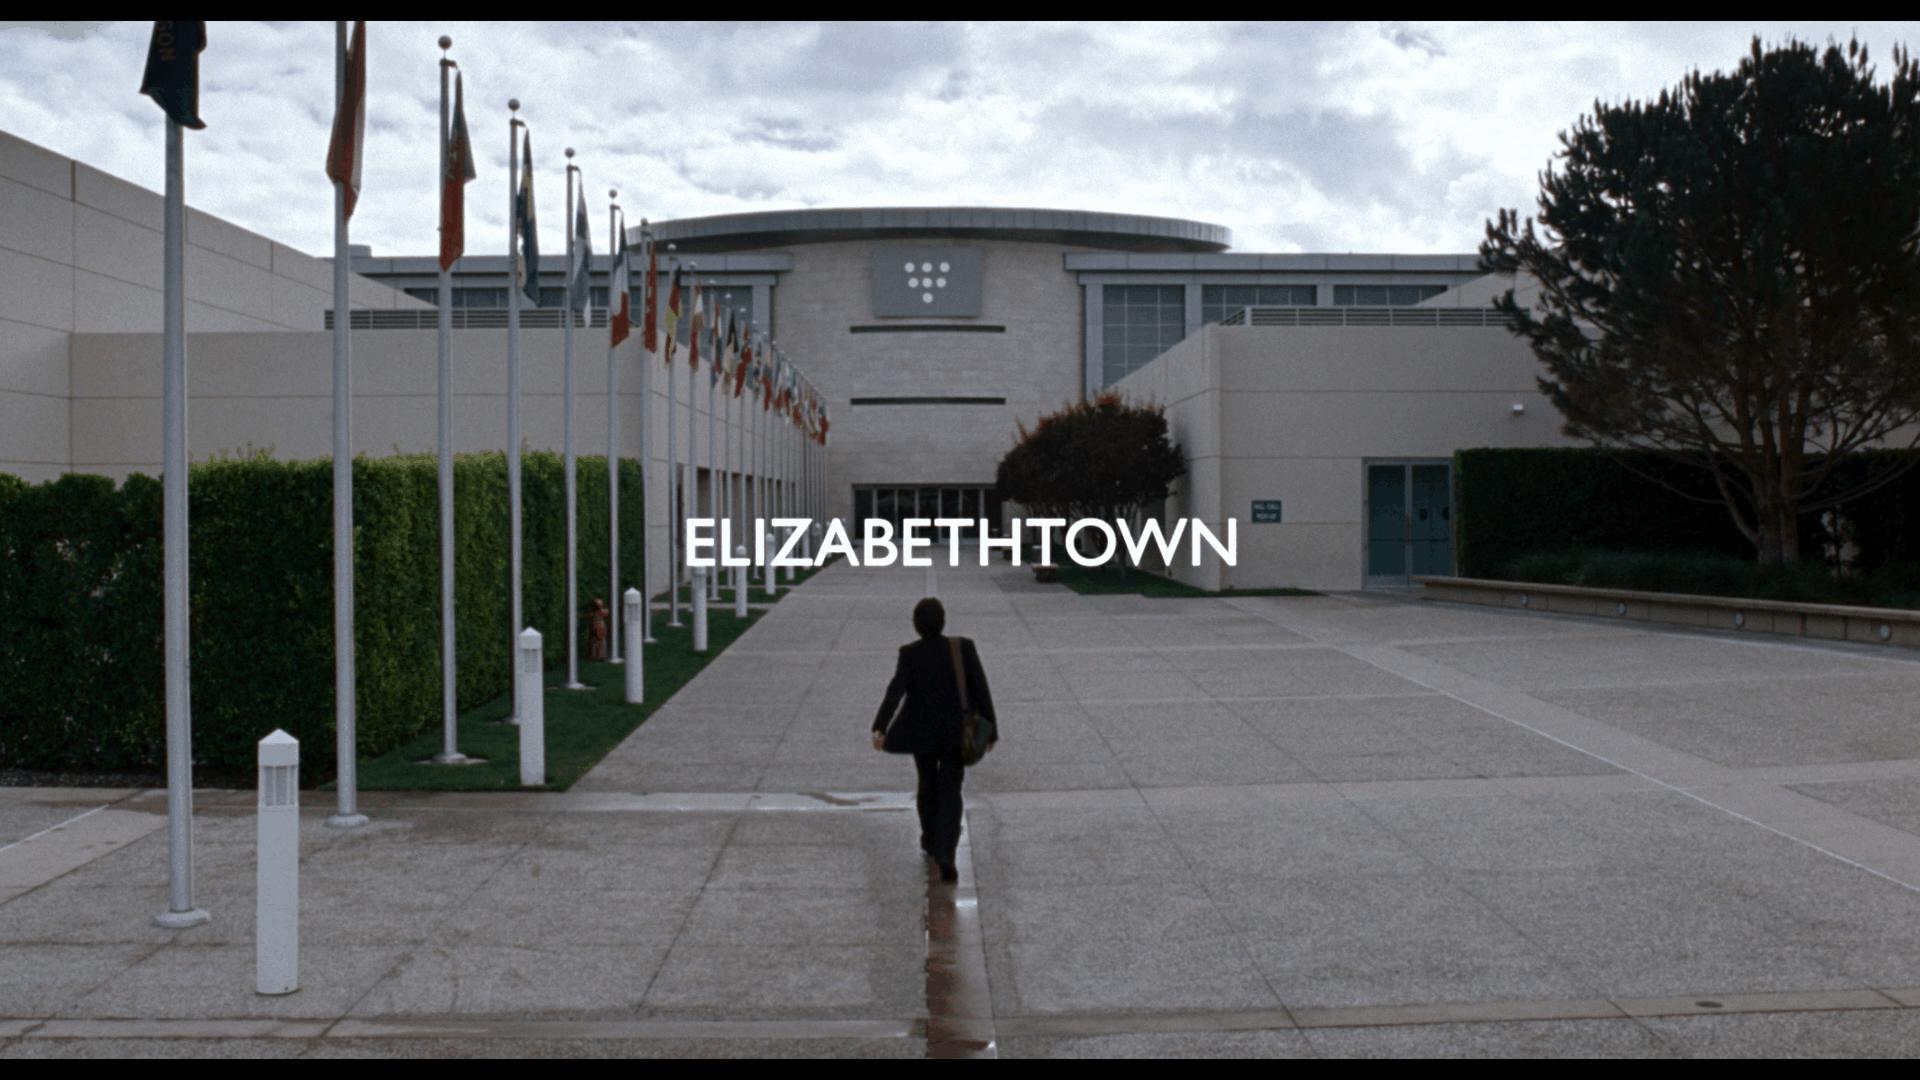 elizabethtown title